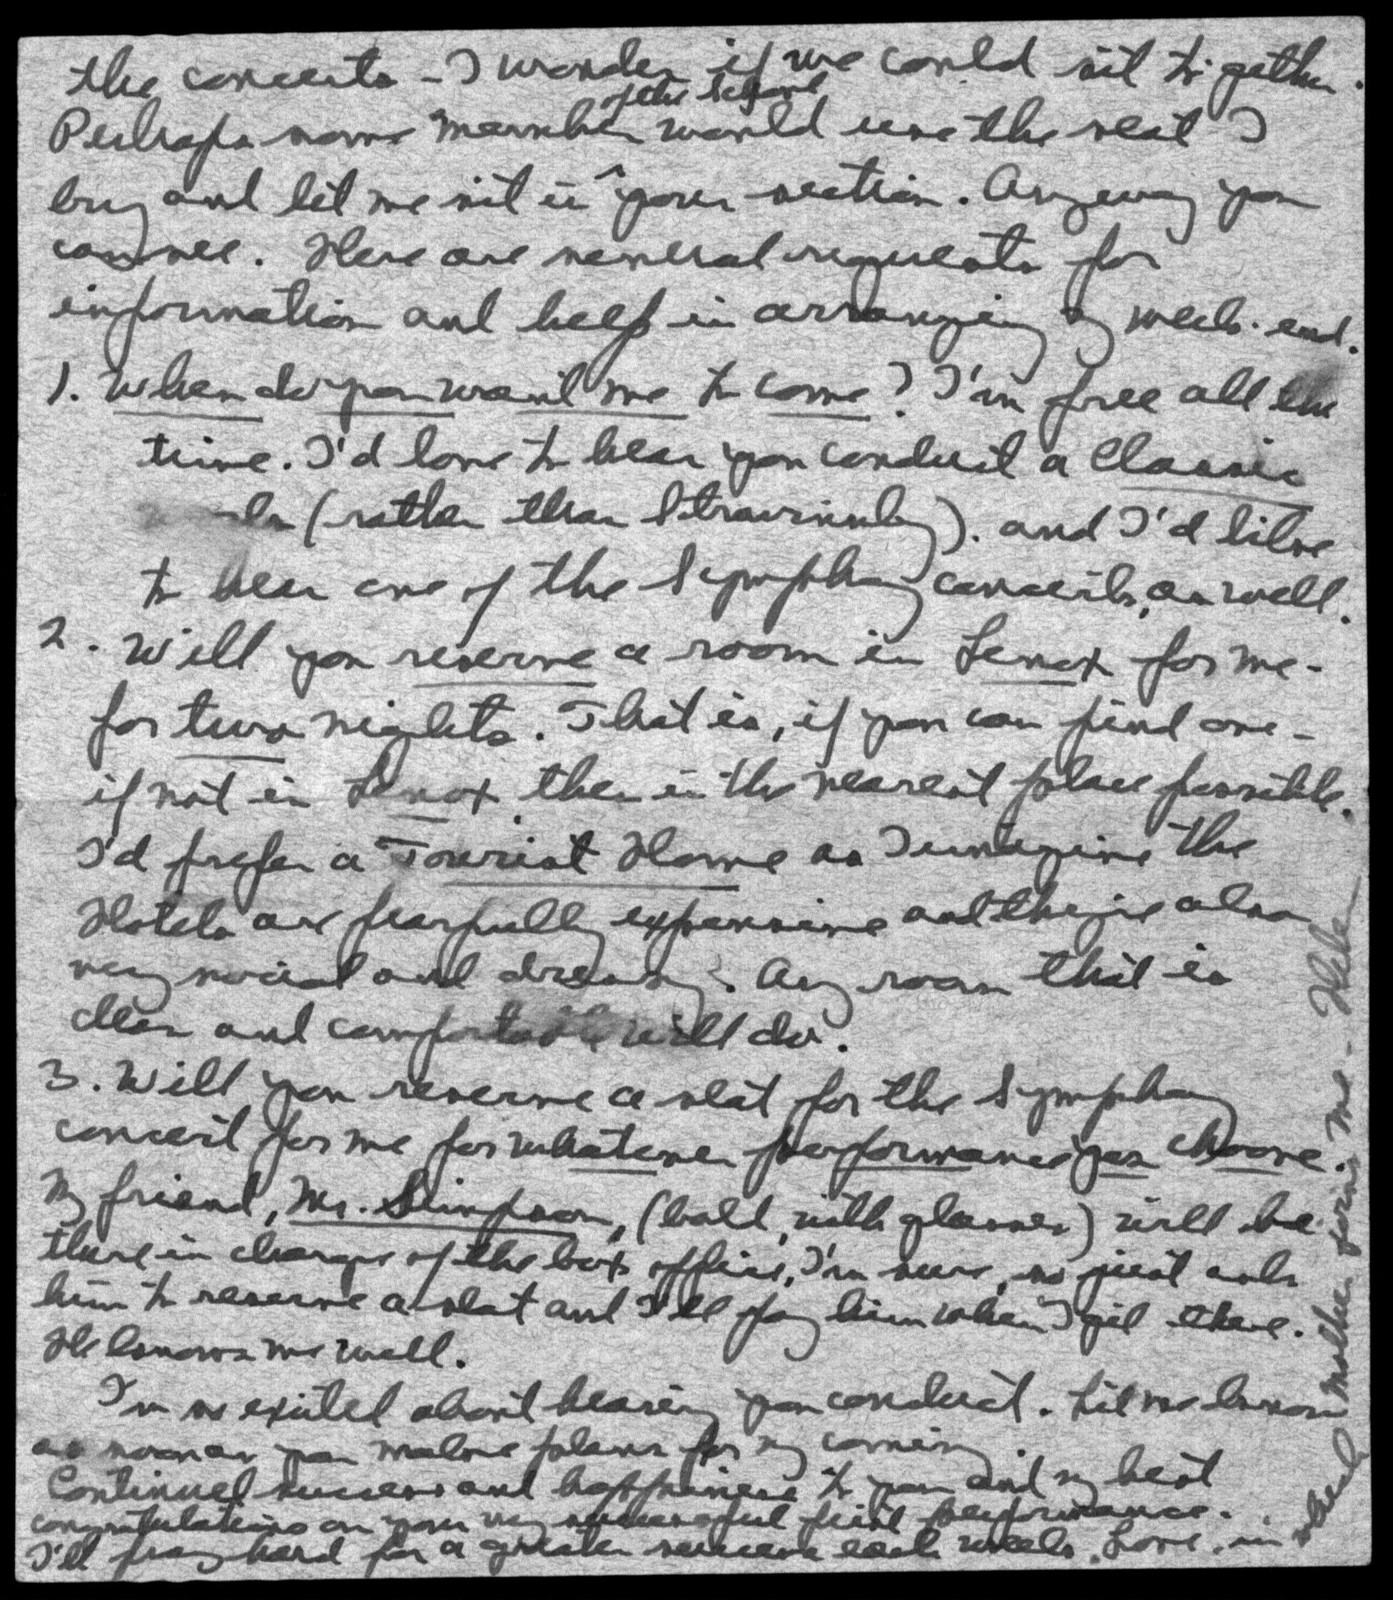 Letter from Helen Coates to Leonard Bernstein, July 21, 1940